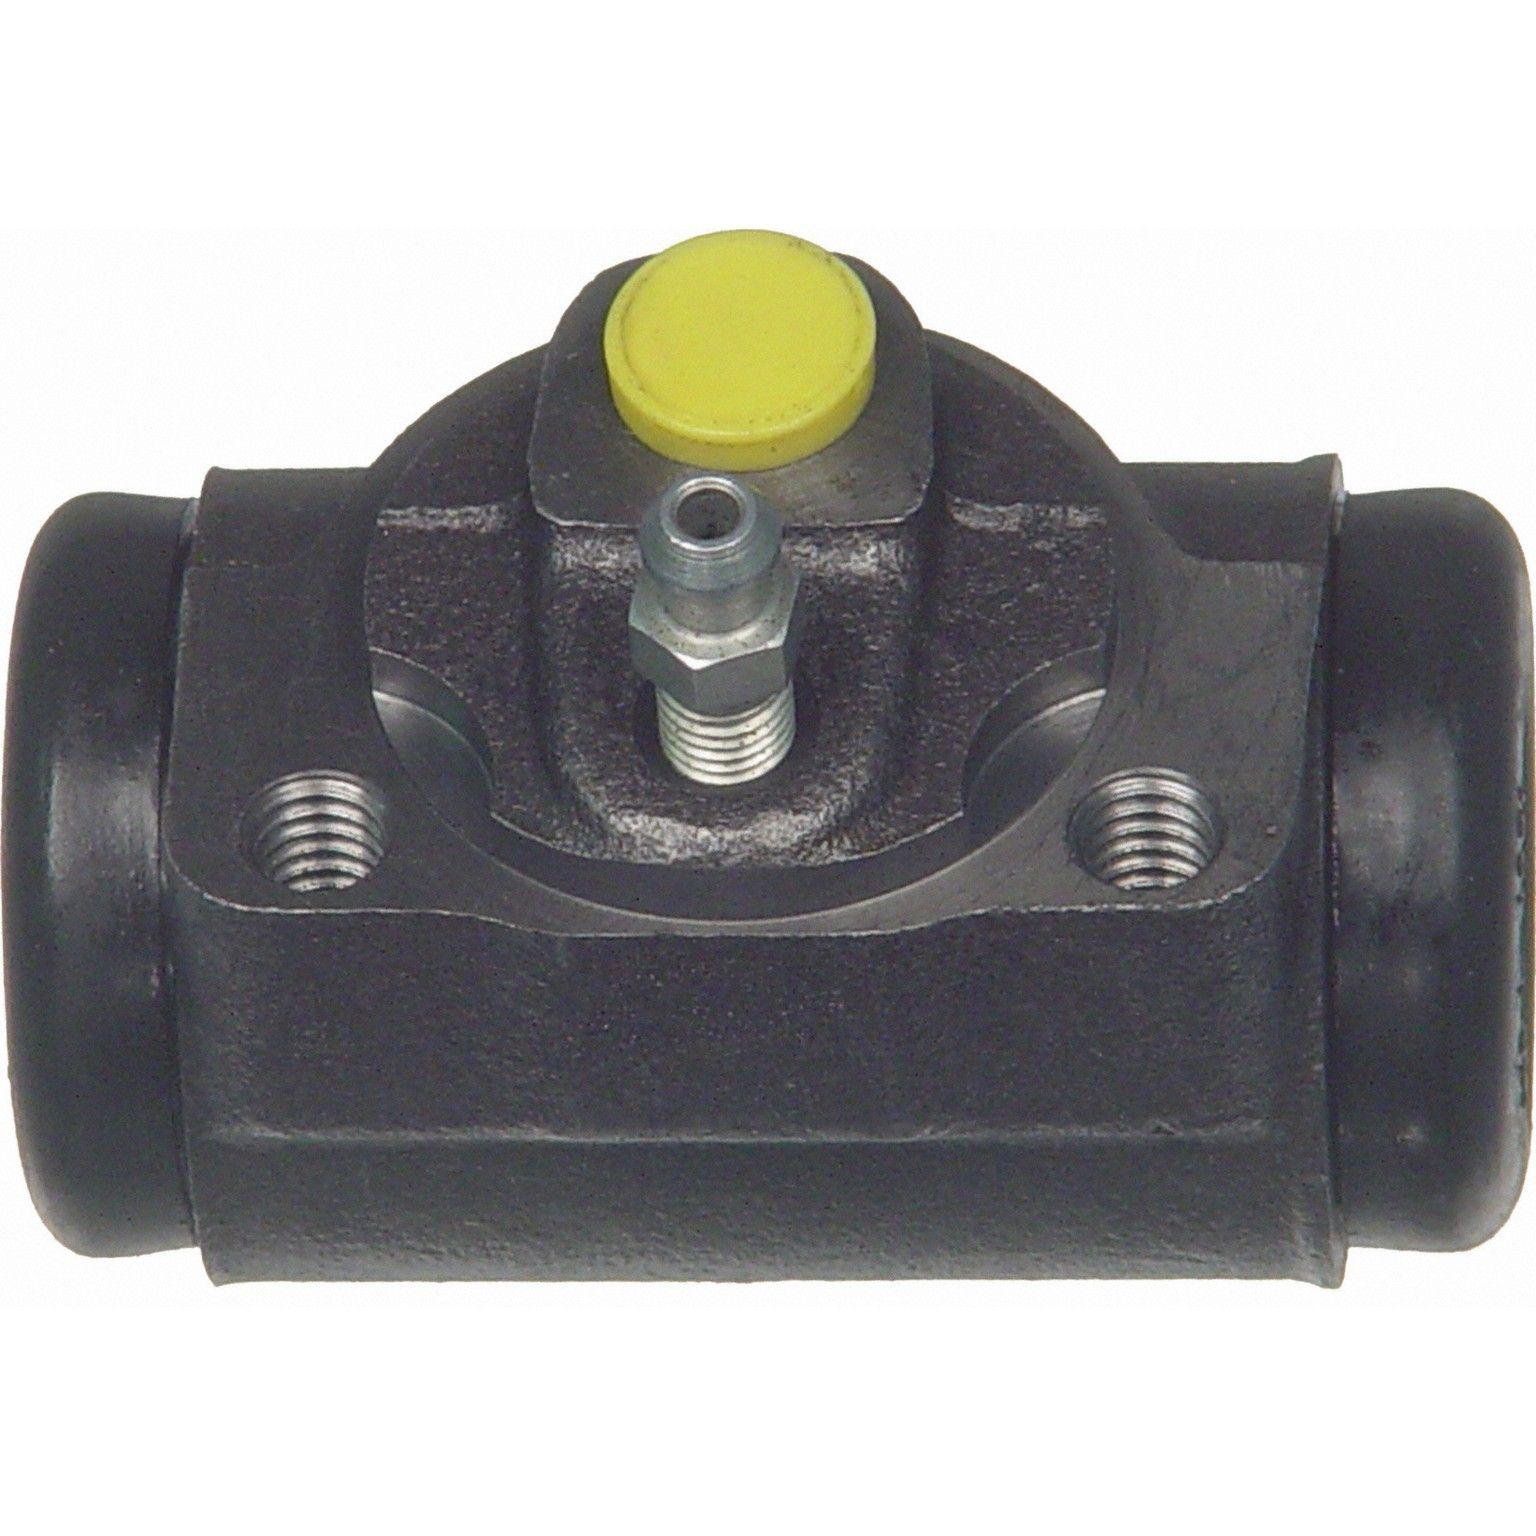 GMC G3500 Drum Brake Wheel Cylinder Replacement (ACDelco